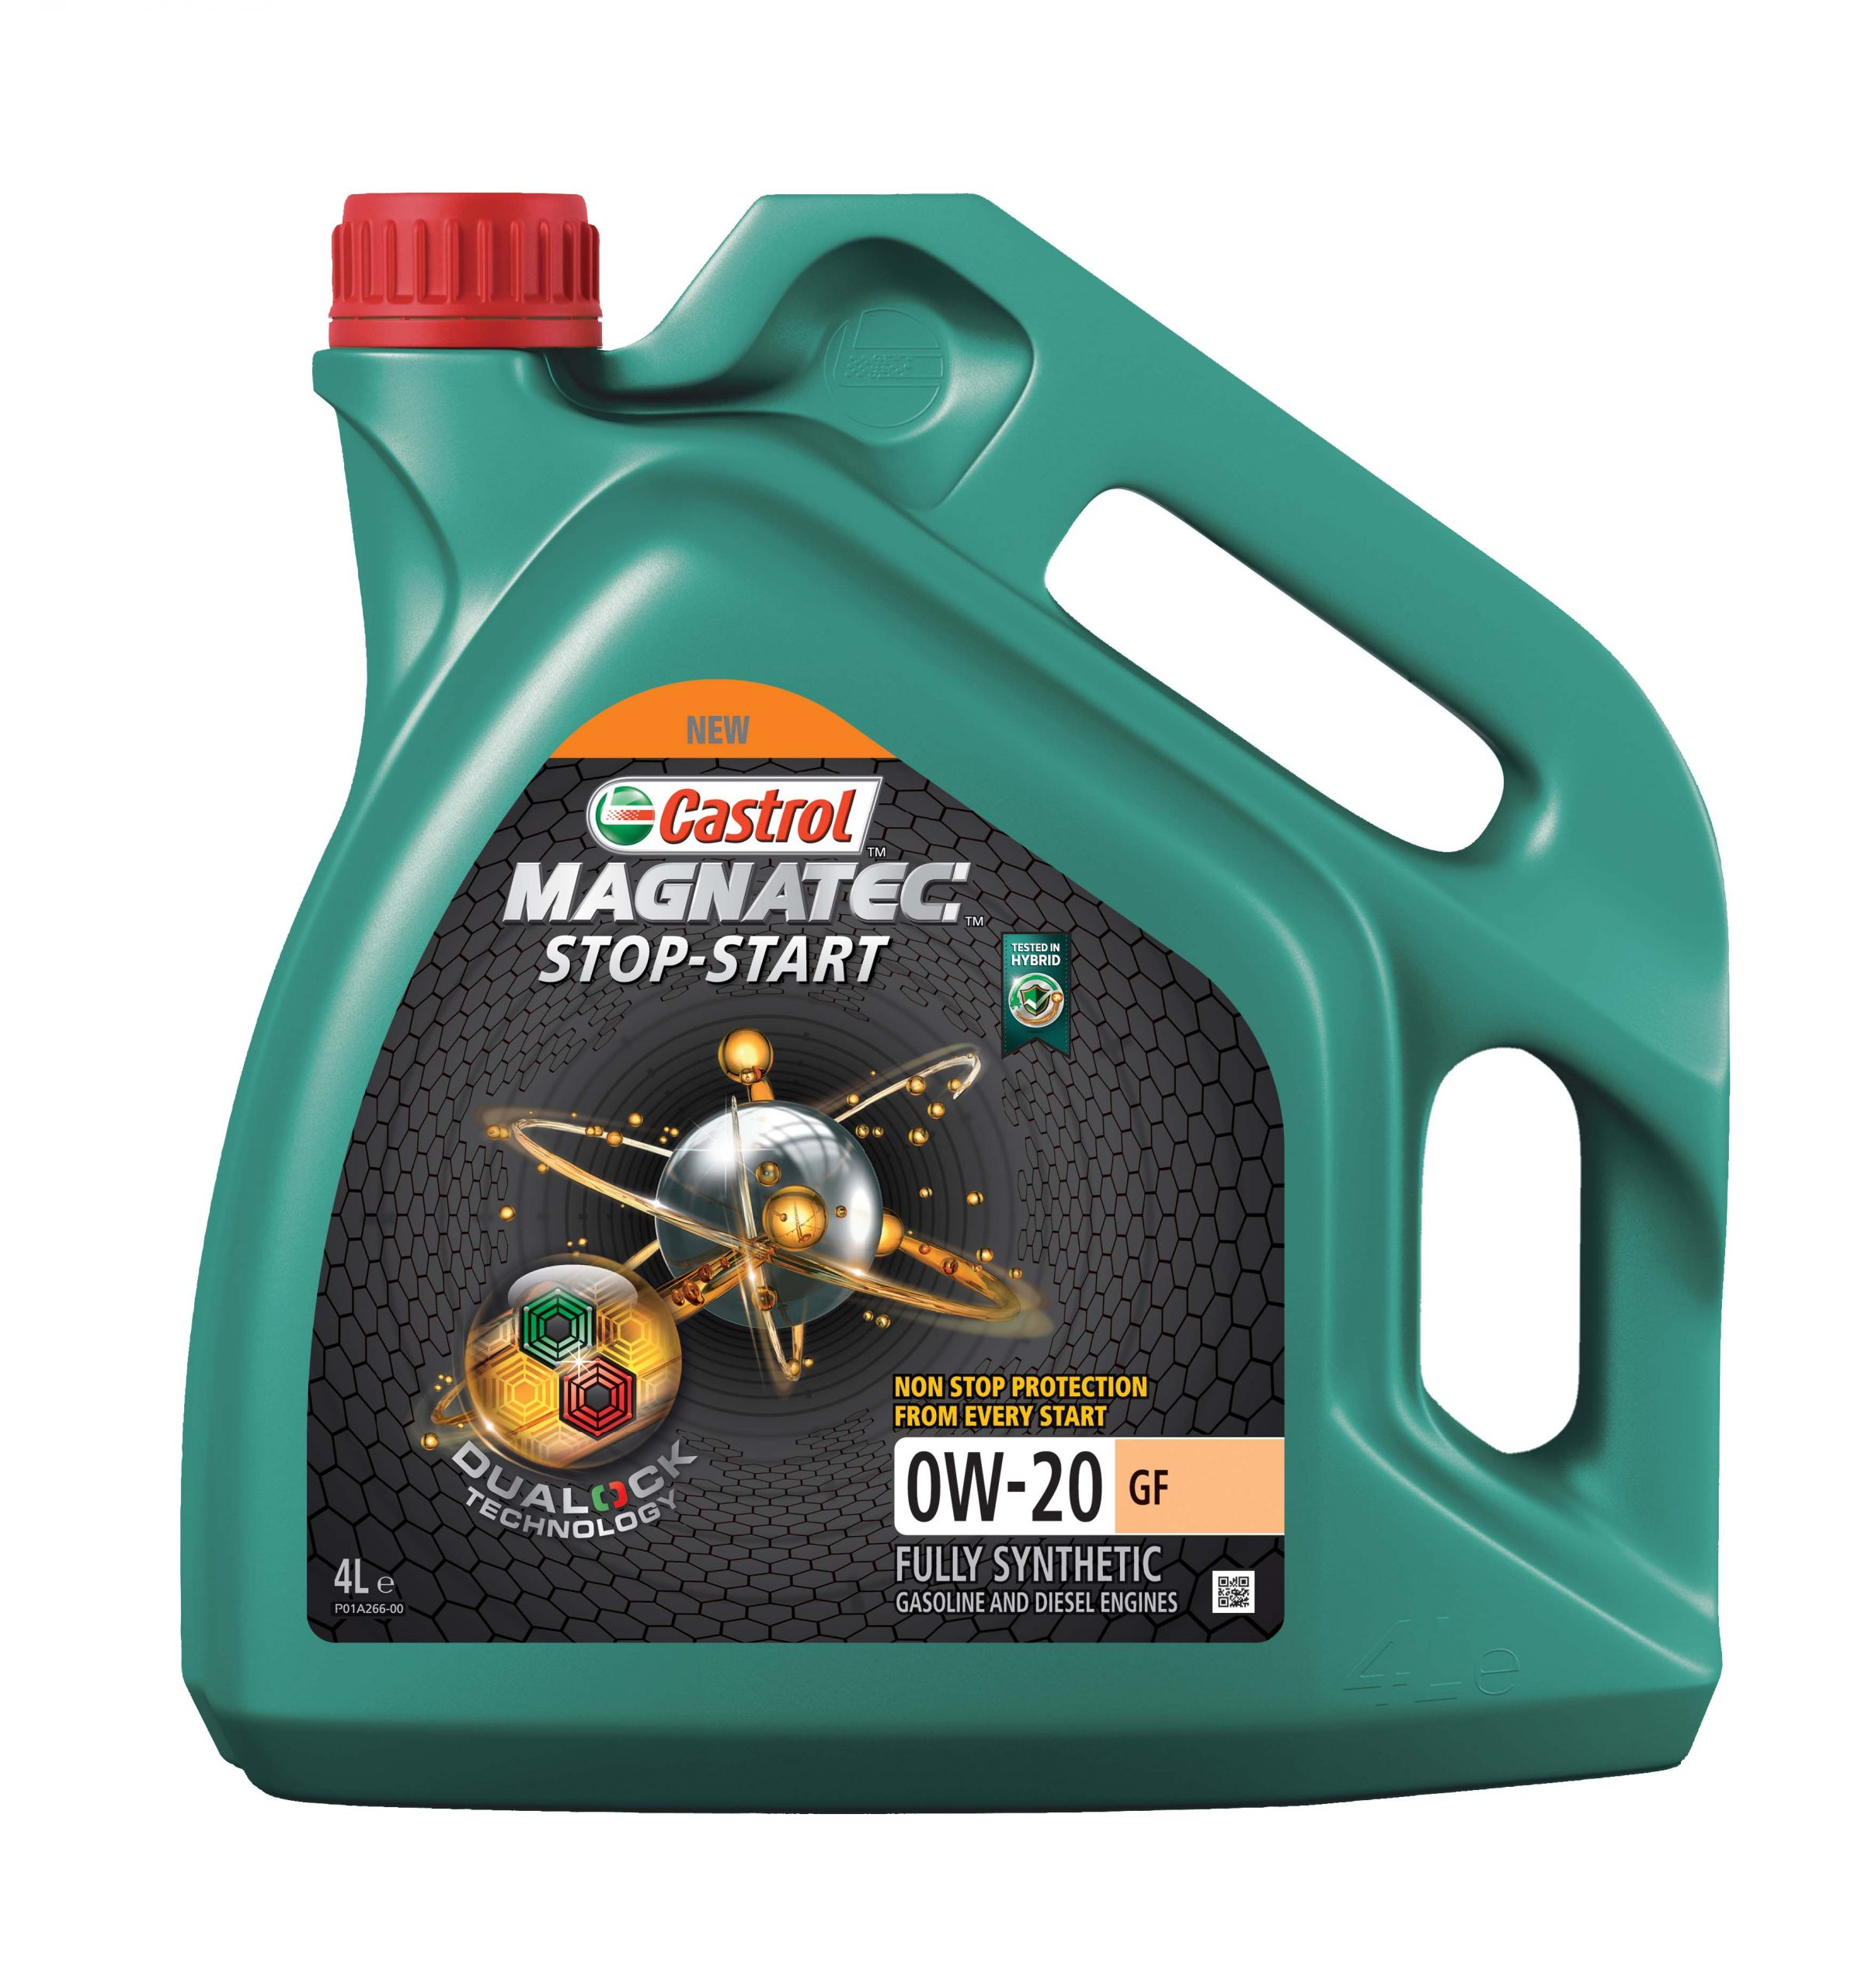 CASTROL-MAGNATEC-STOP-START-0W-20-GF